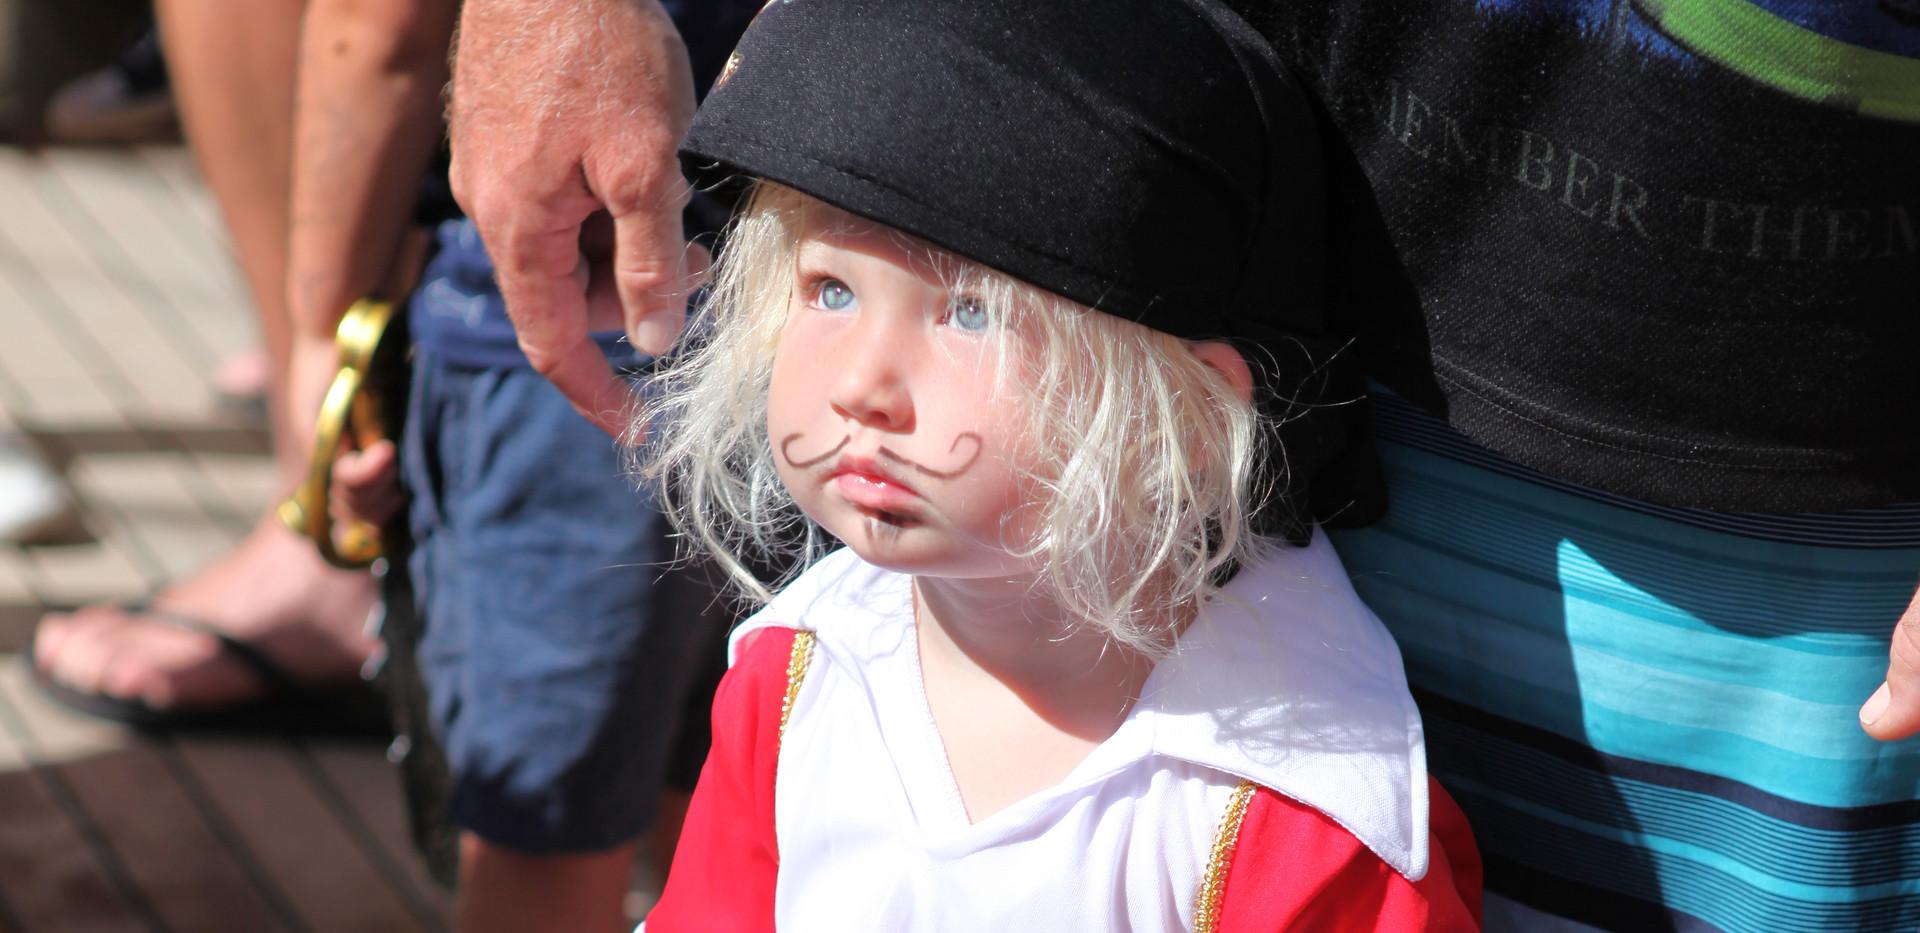 Pirate 5.JPG